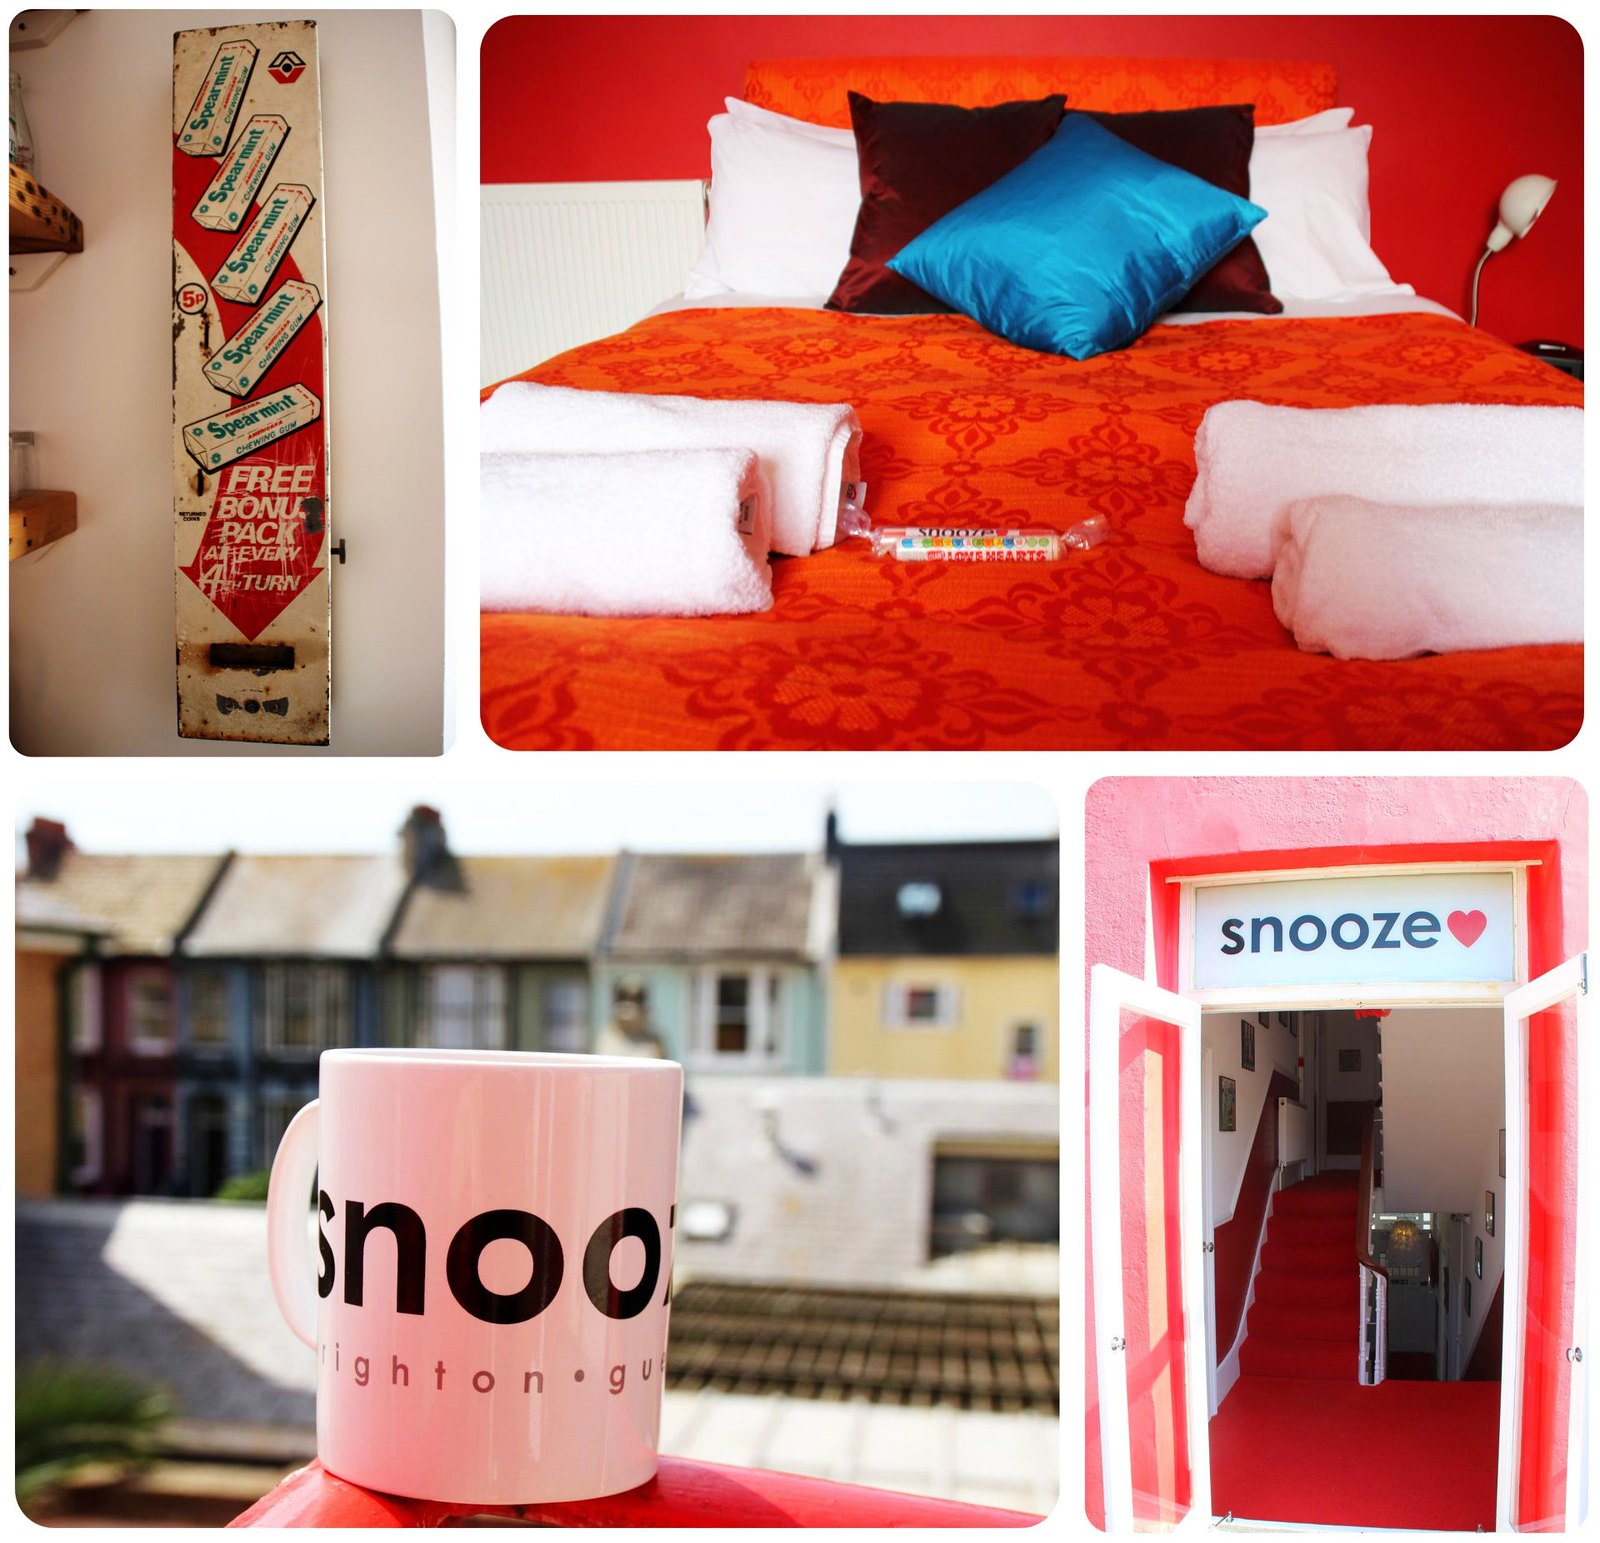 Brighton Snooze Bed & Breakfast England